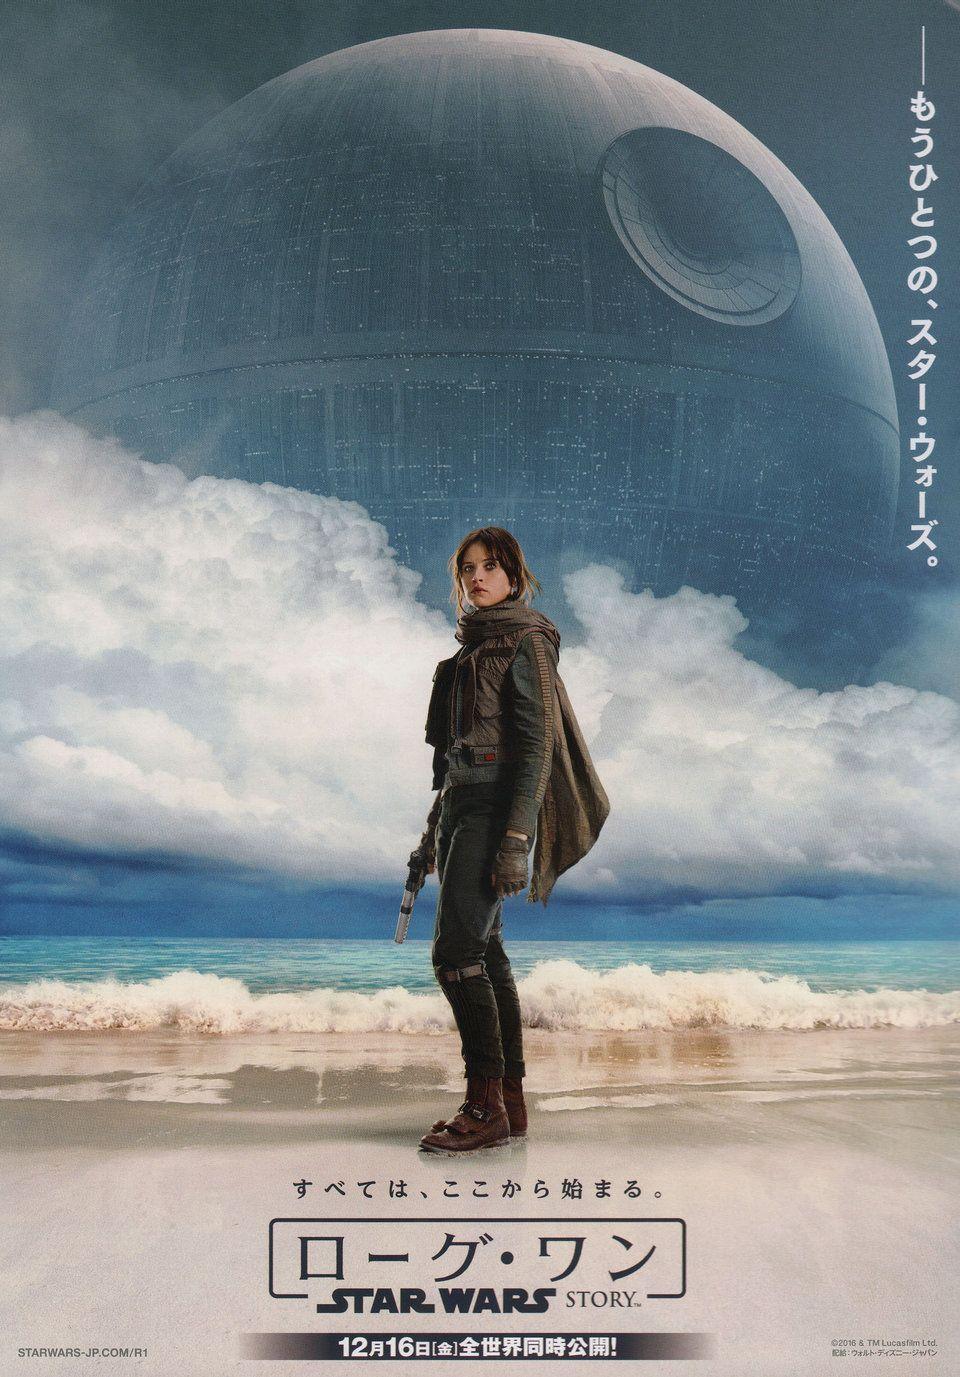 Rogue One: A Star Wars Story 2016 Japanese B5 Chirashi Flyer   Posteritati Movie Poster Gallery   New York